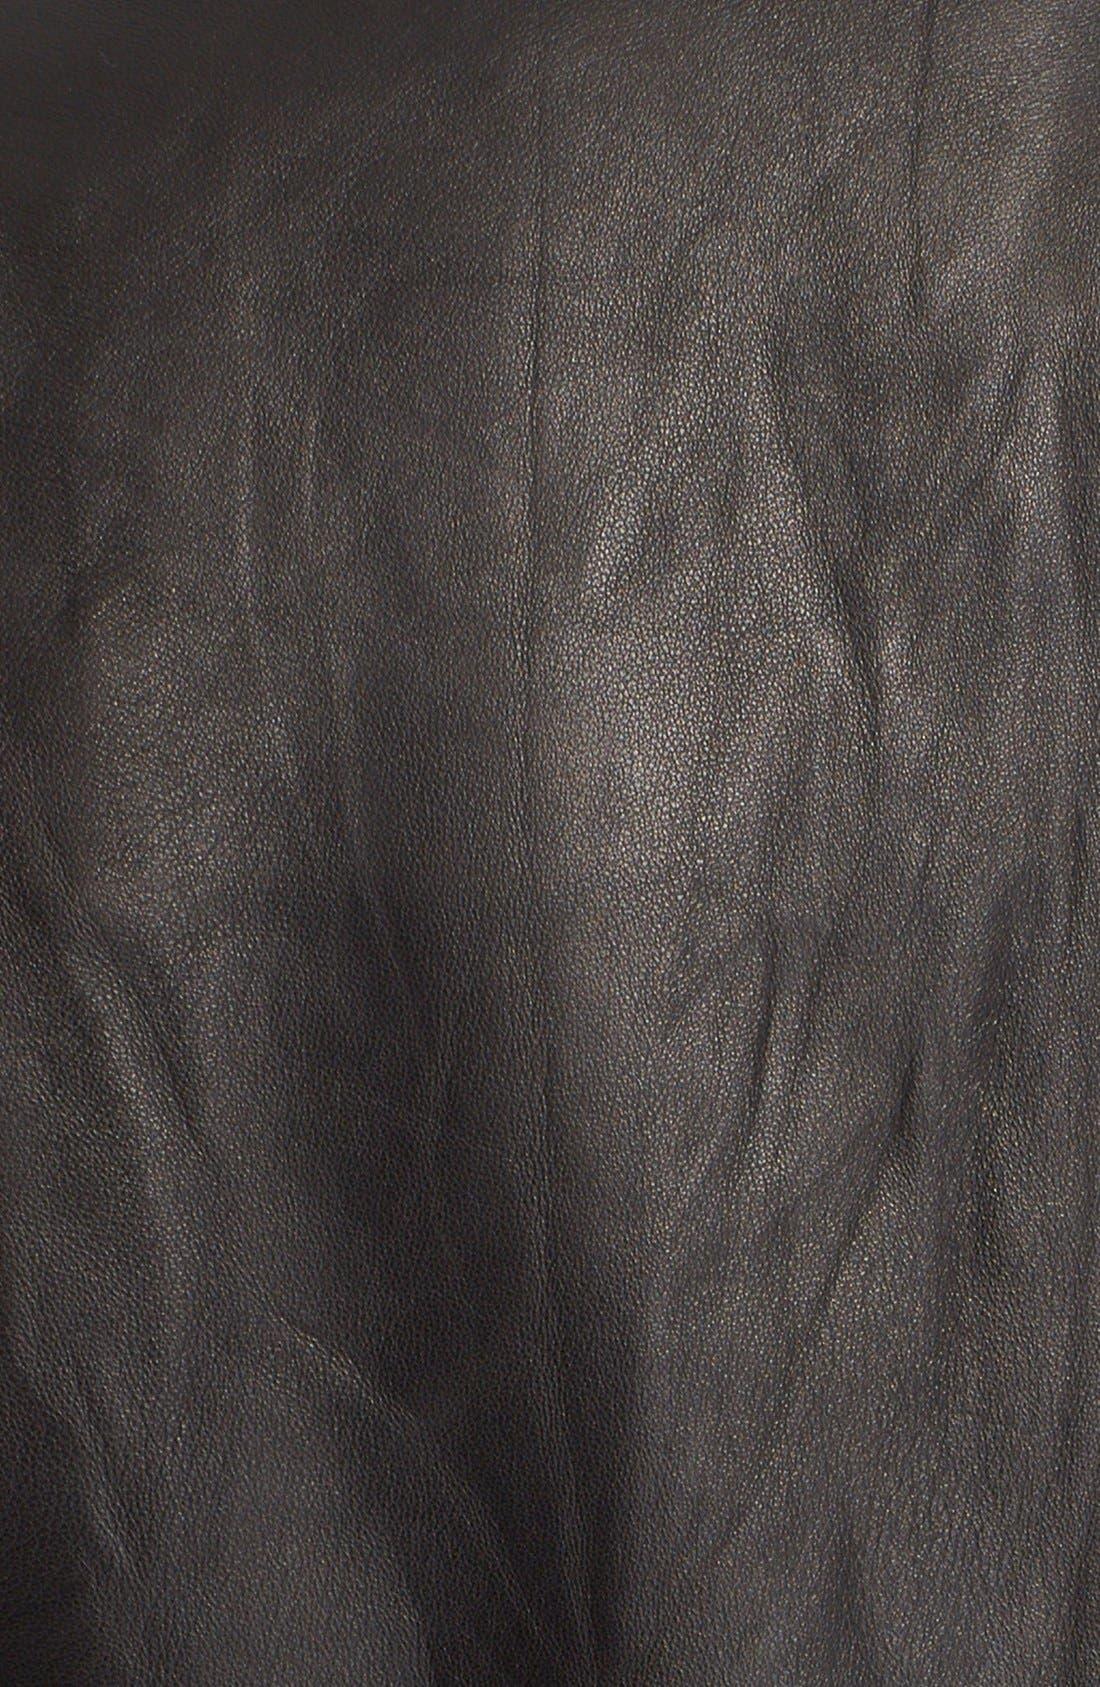 'Ashville' Leather Jacket,                             Alternate thumbnail 5, color,                             Black